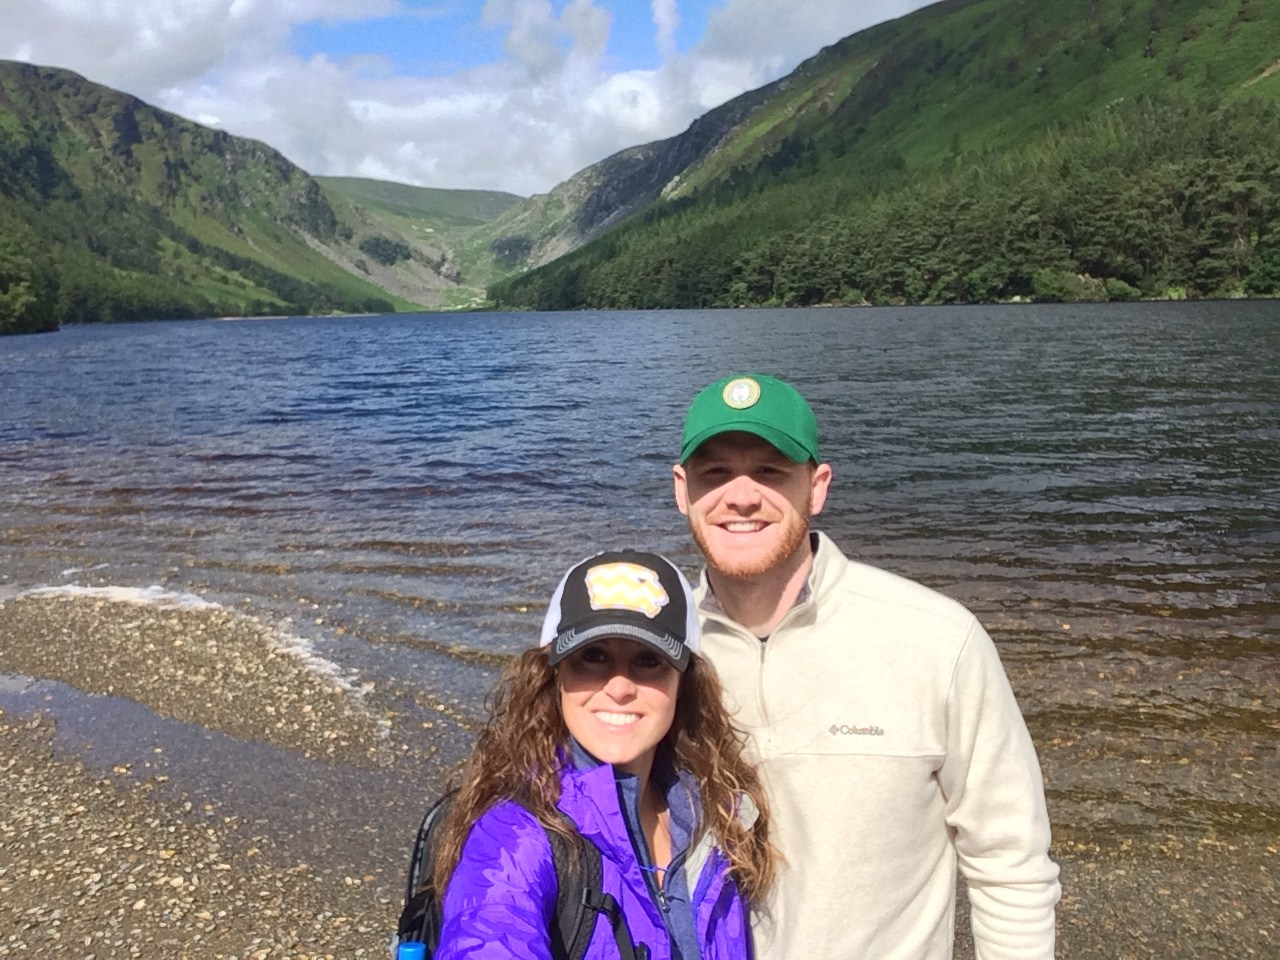 My husband and I at Glendalough in Ireland 2016.